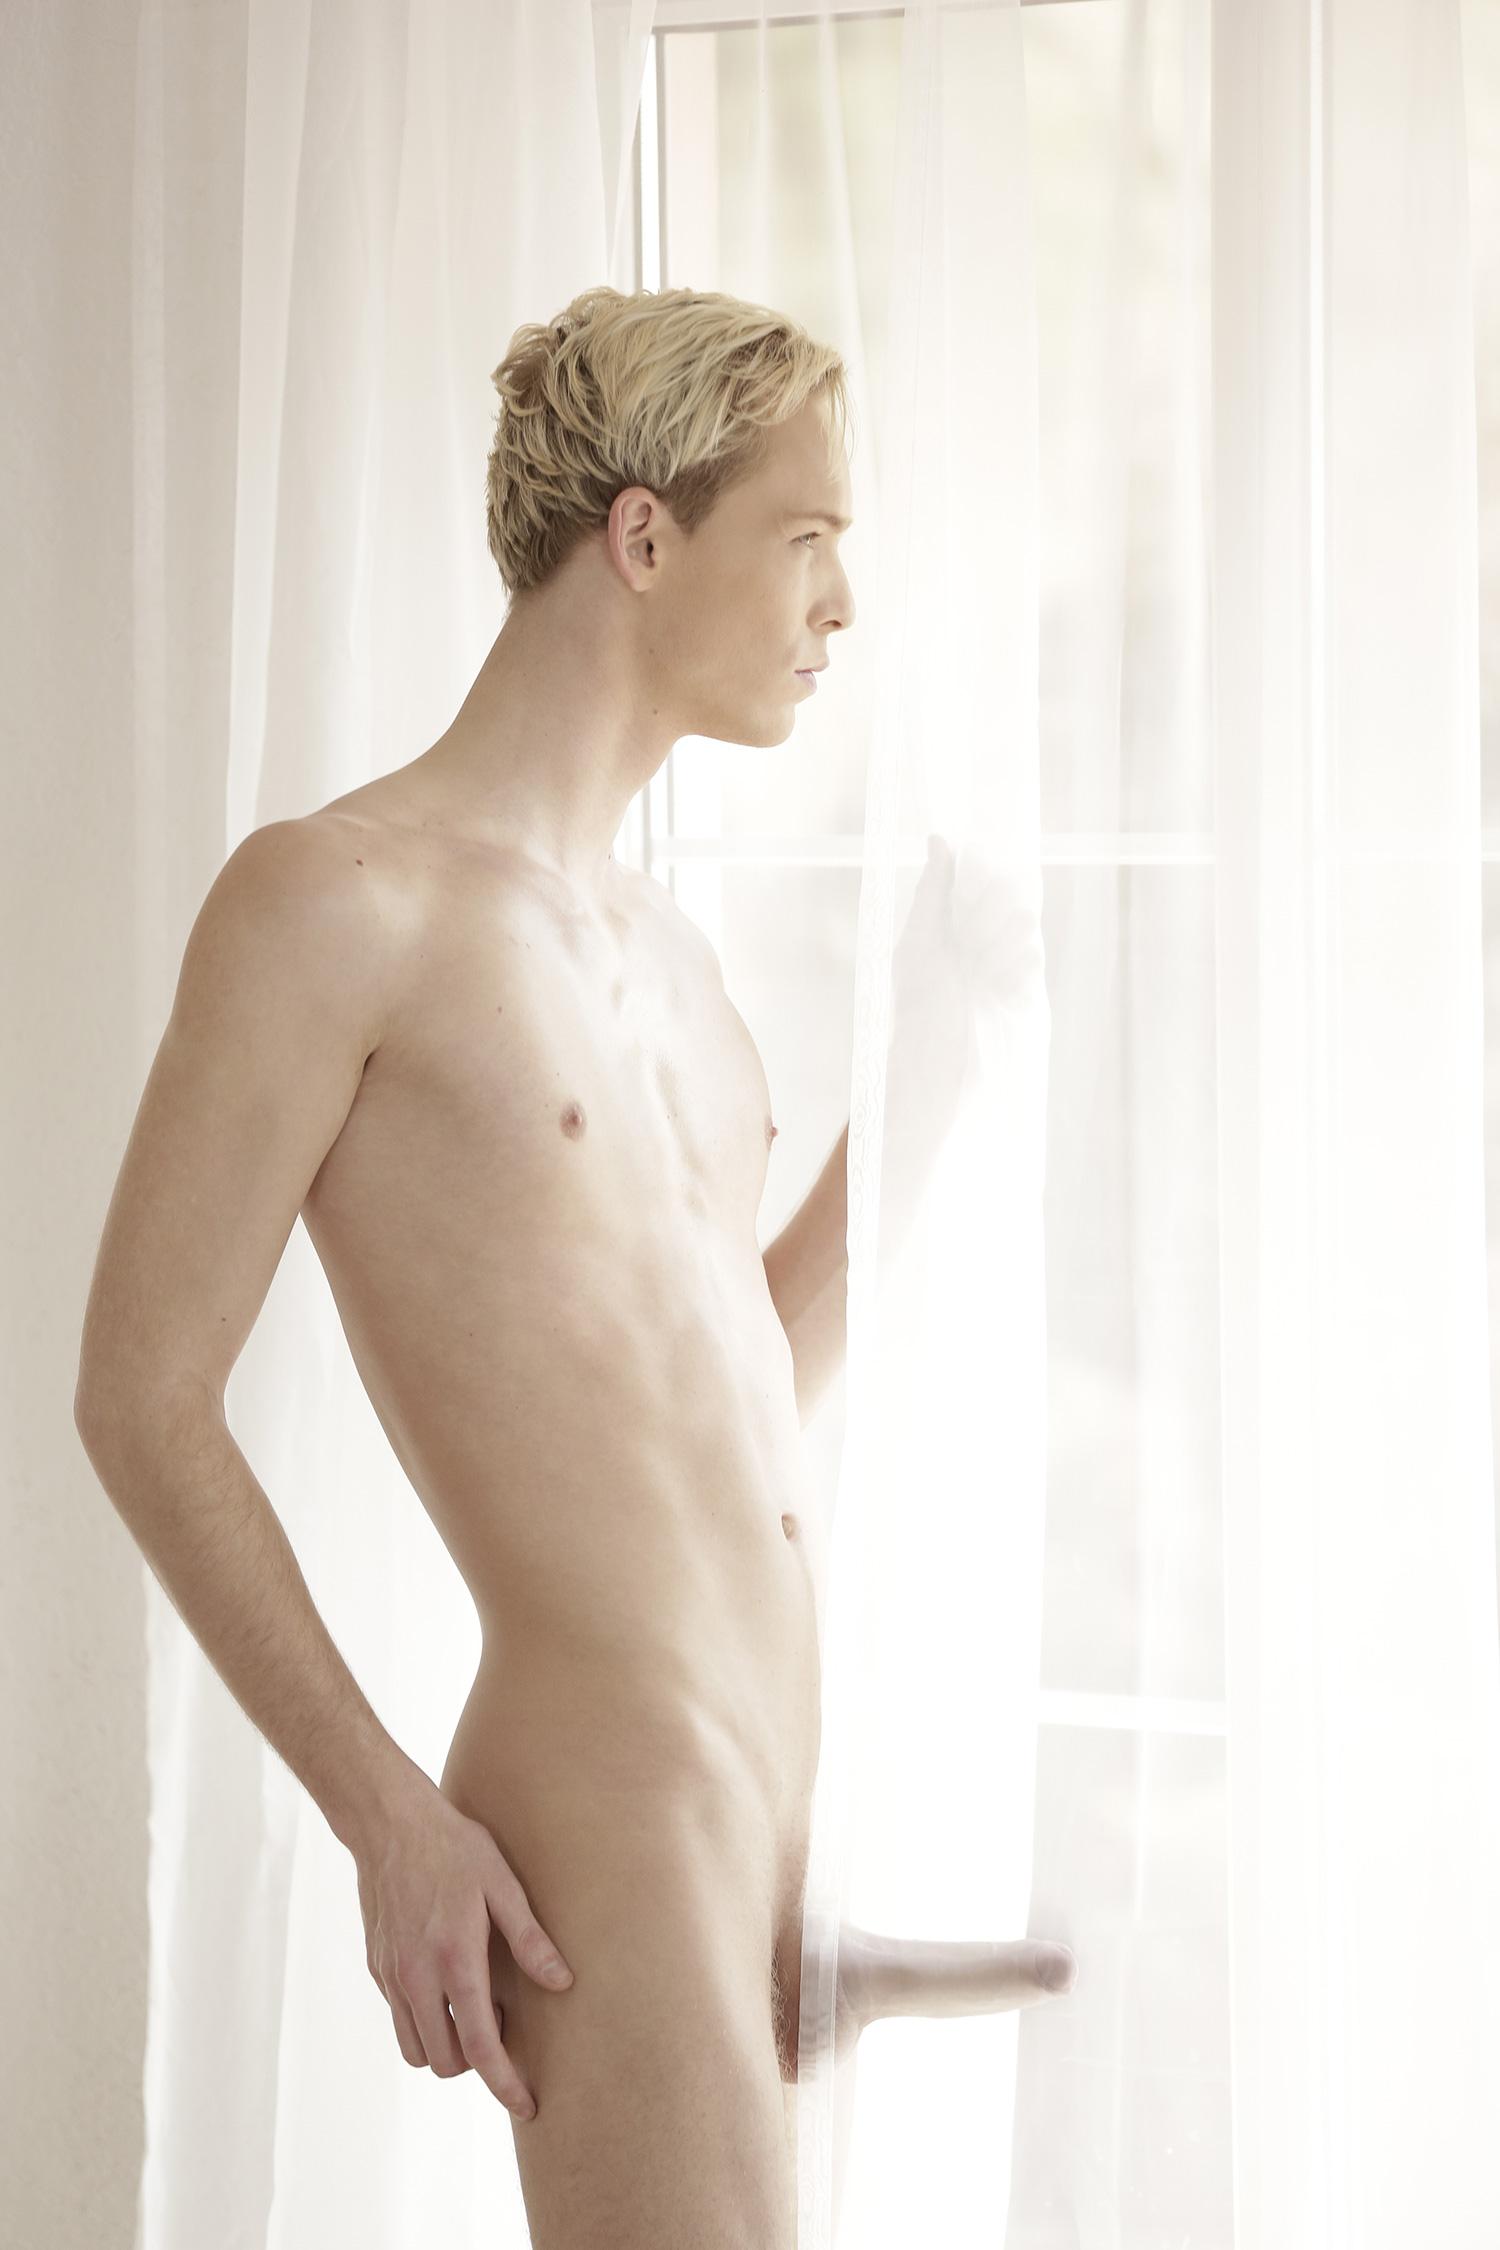 Nude gay twink bike movie josh bensan is 6